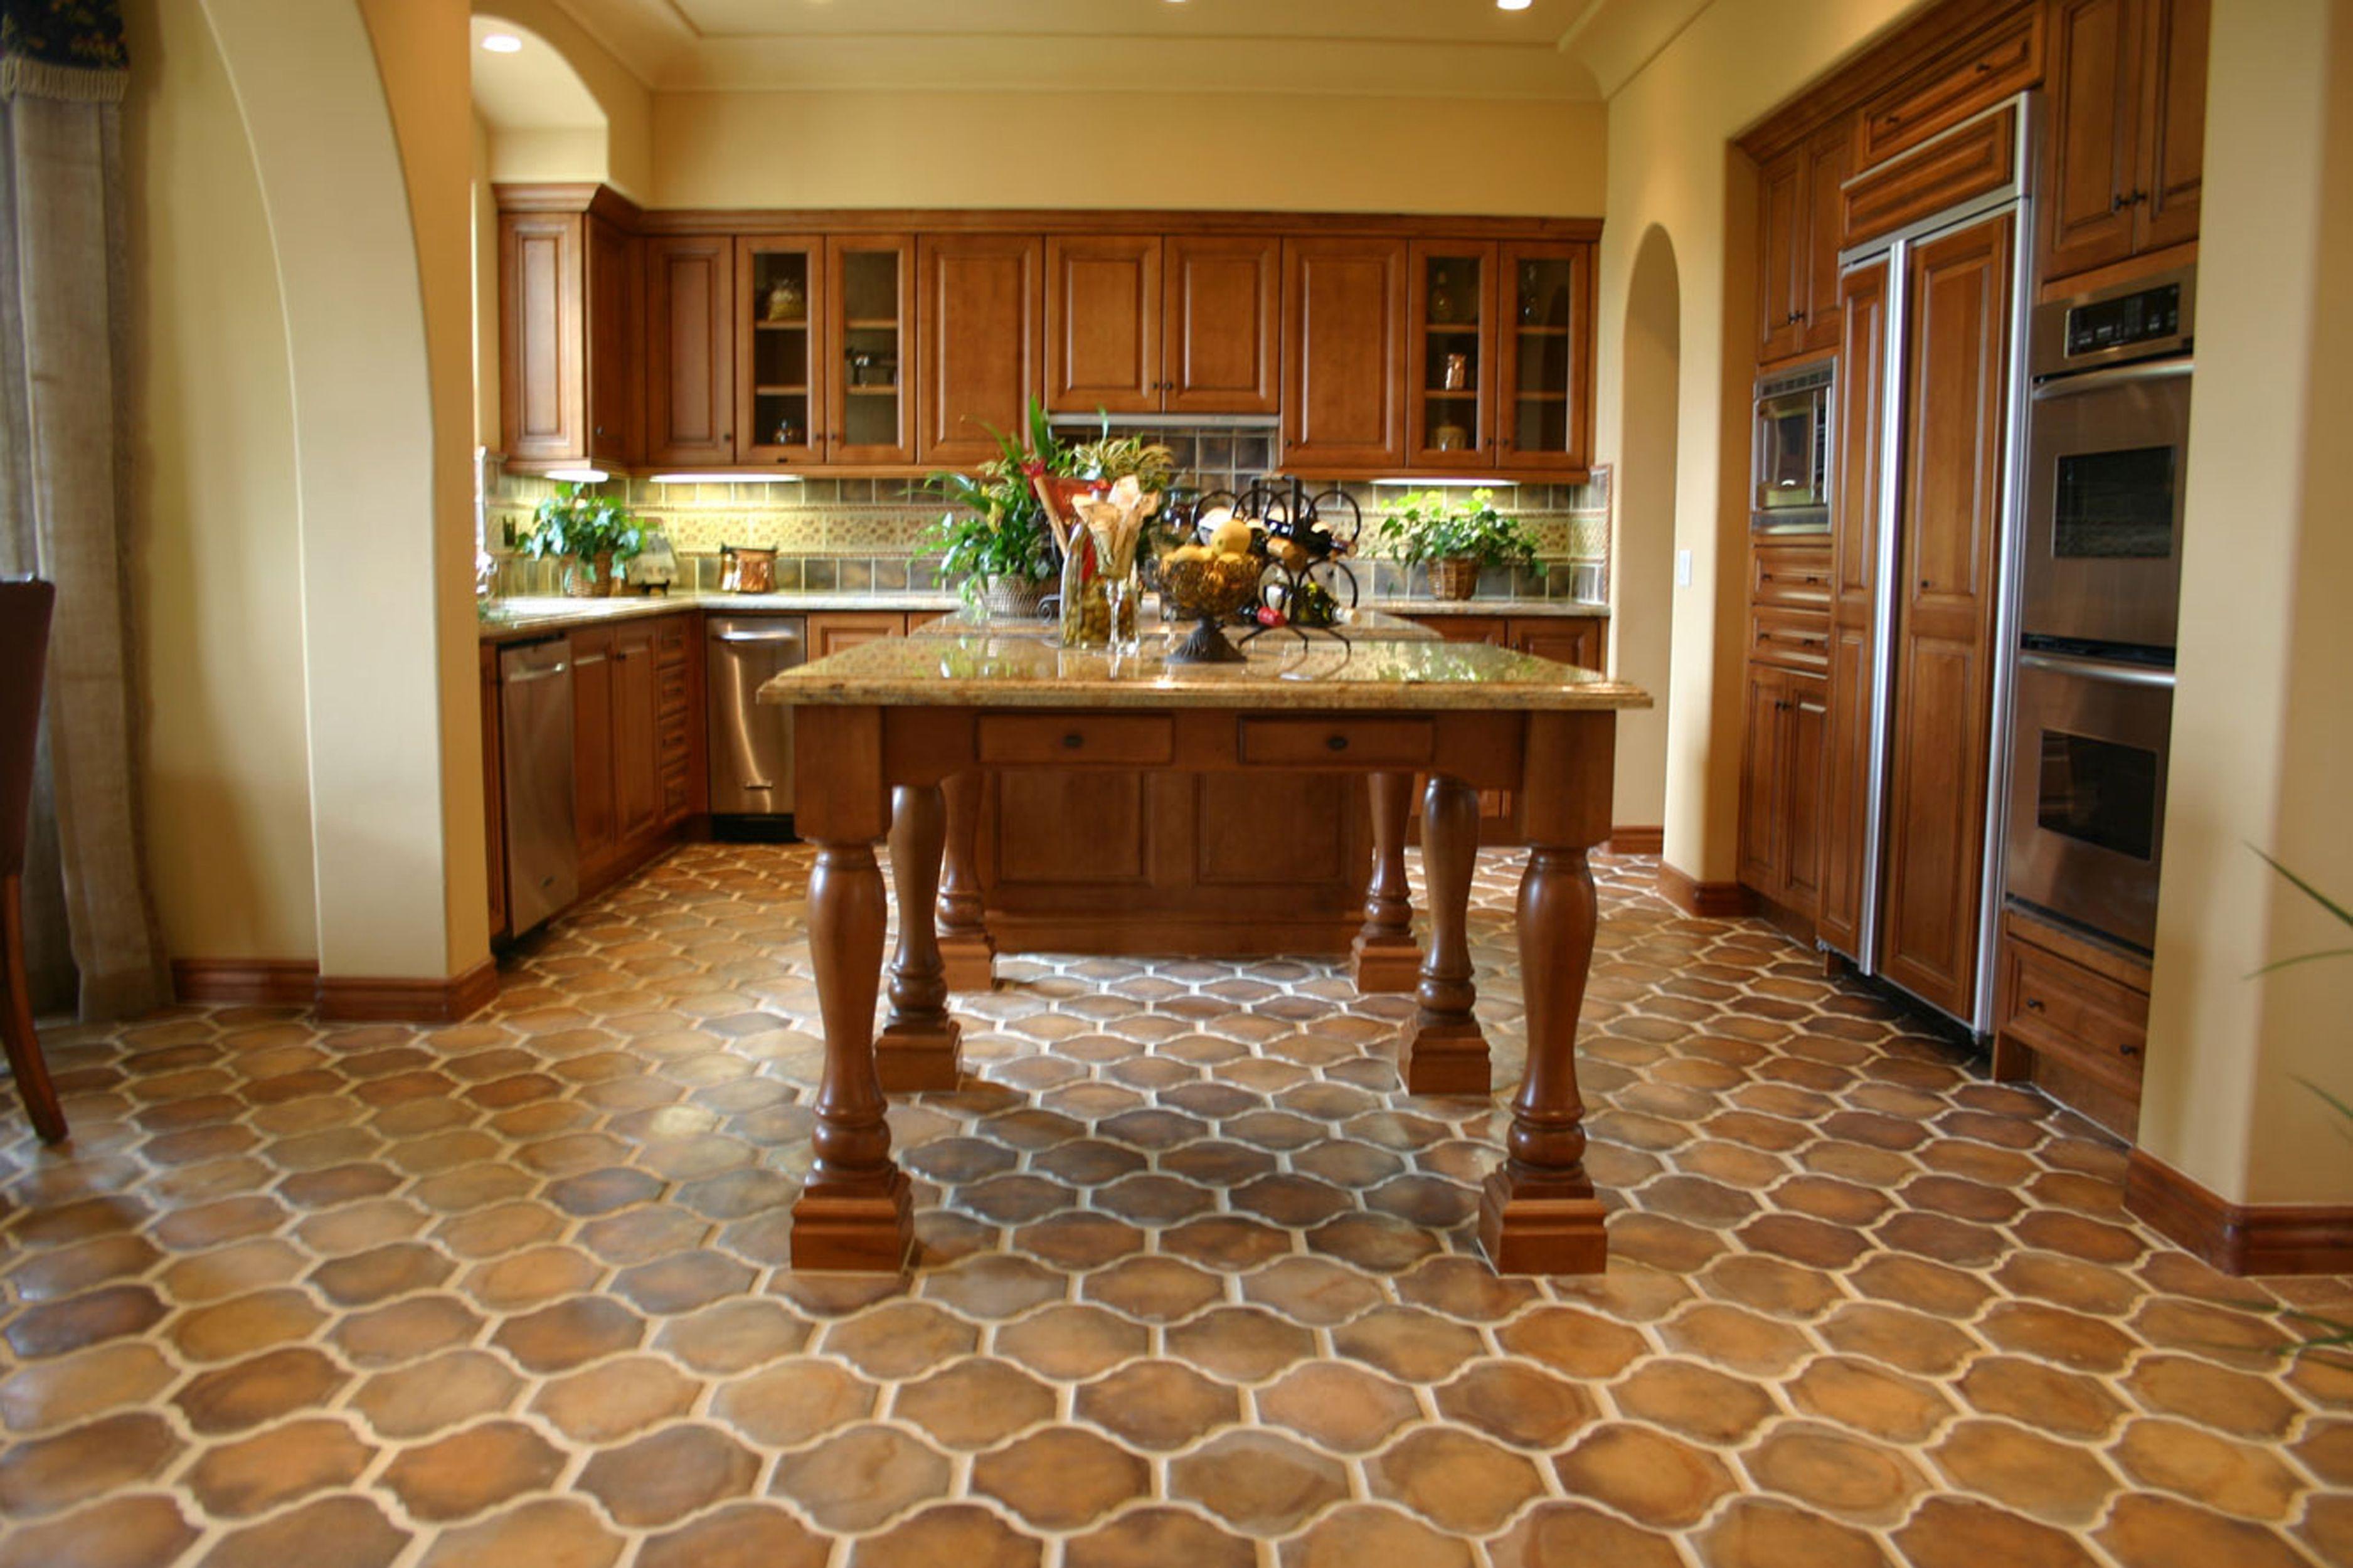 Ann Sacks Hacienda 9 X 11 1 4 San Felipe Pillowed Concrete Field In Tuscan Mustard Saltillo Tile Concrete Tiles Brown Floors